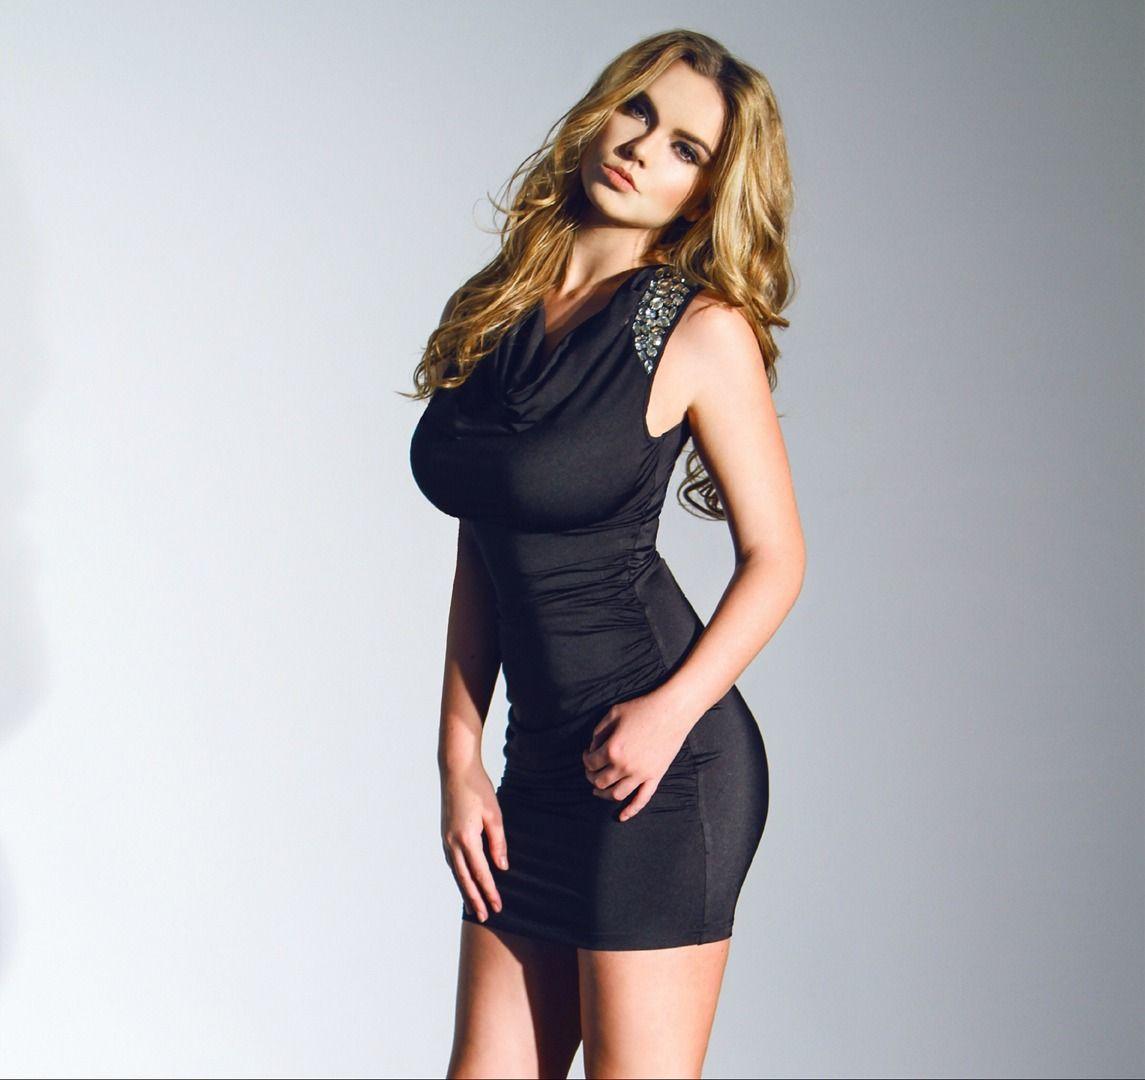 Model - Lauren Victoria Hanley | Models | Pinterest | Models ...